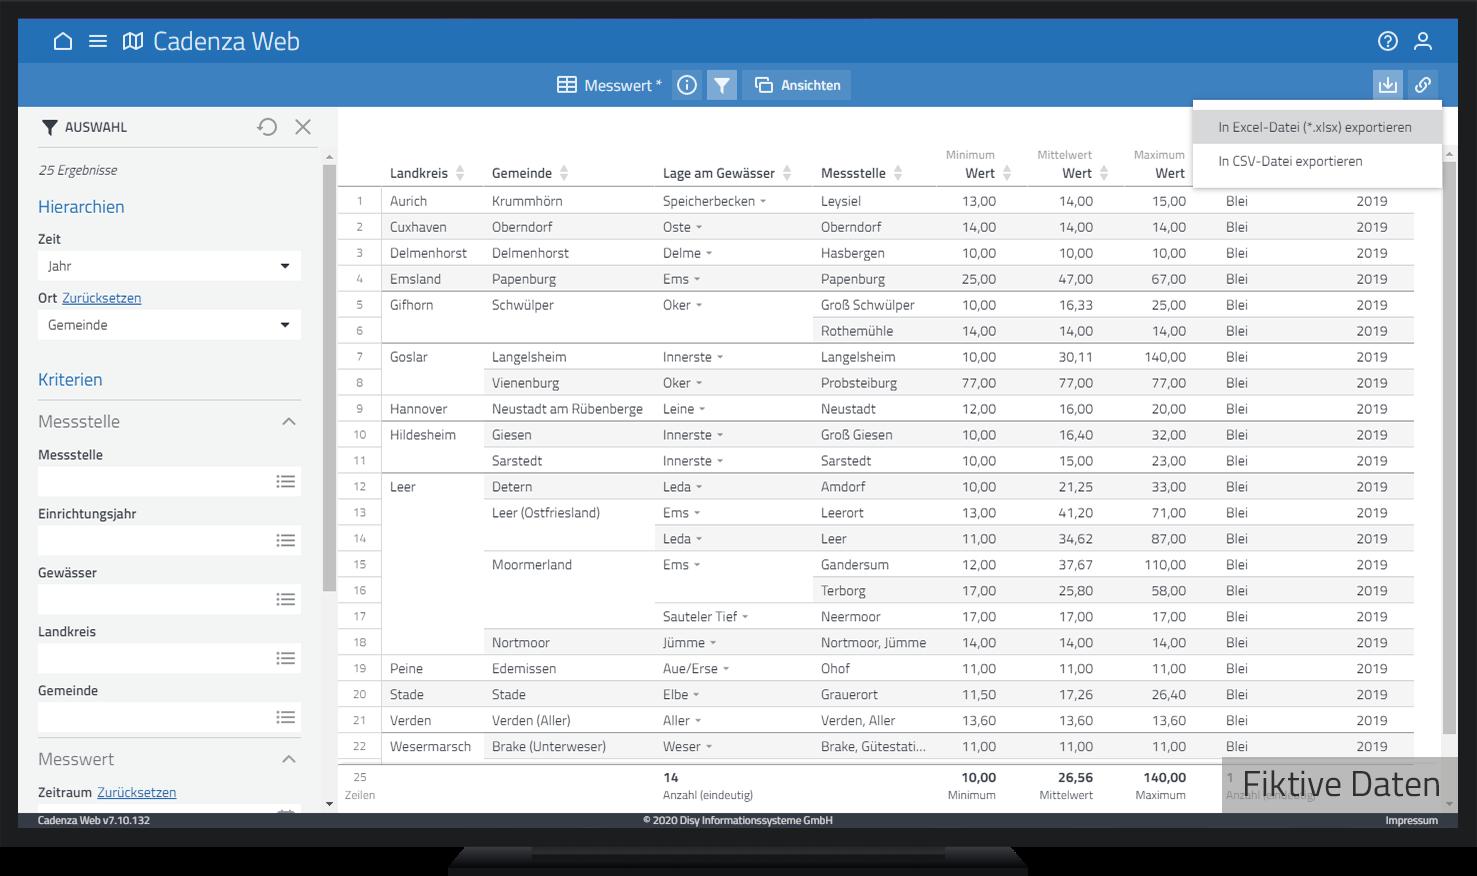 Export der gefilterten und beliebig angeordneten Tabelle als Excel-Tabelle